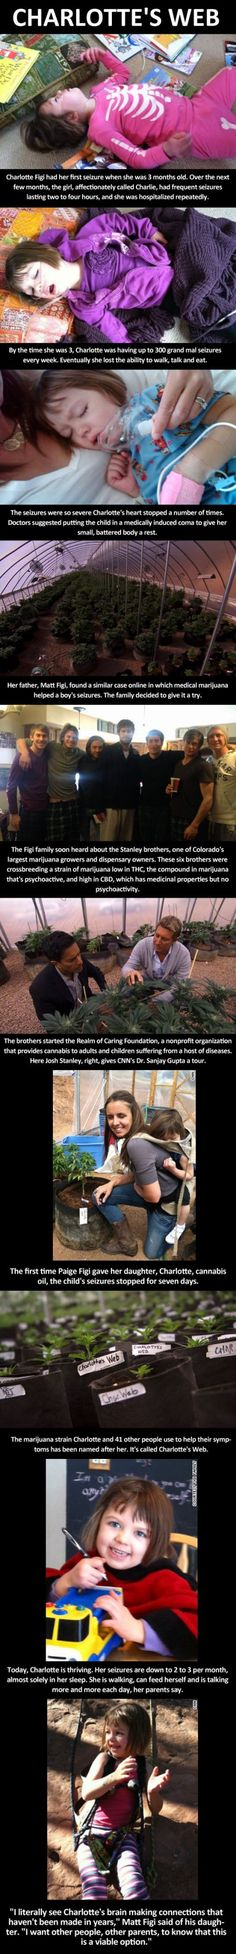 The proper use of Marijuana